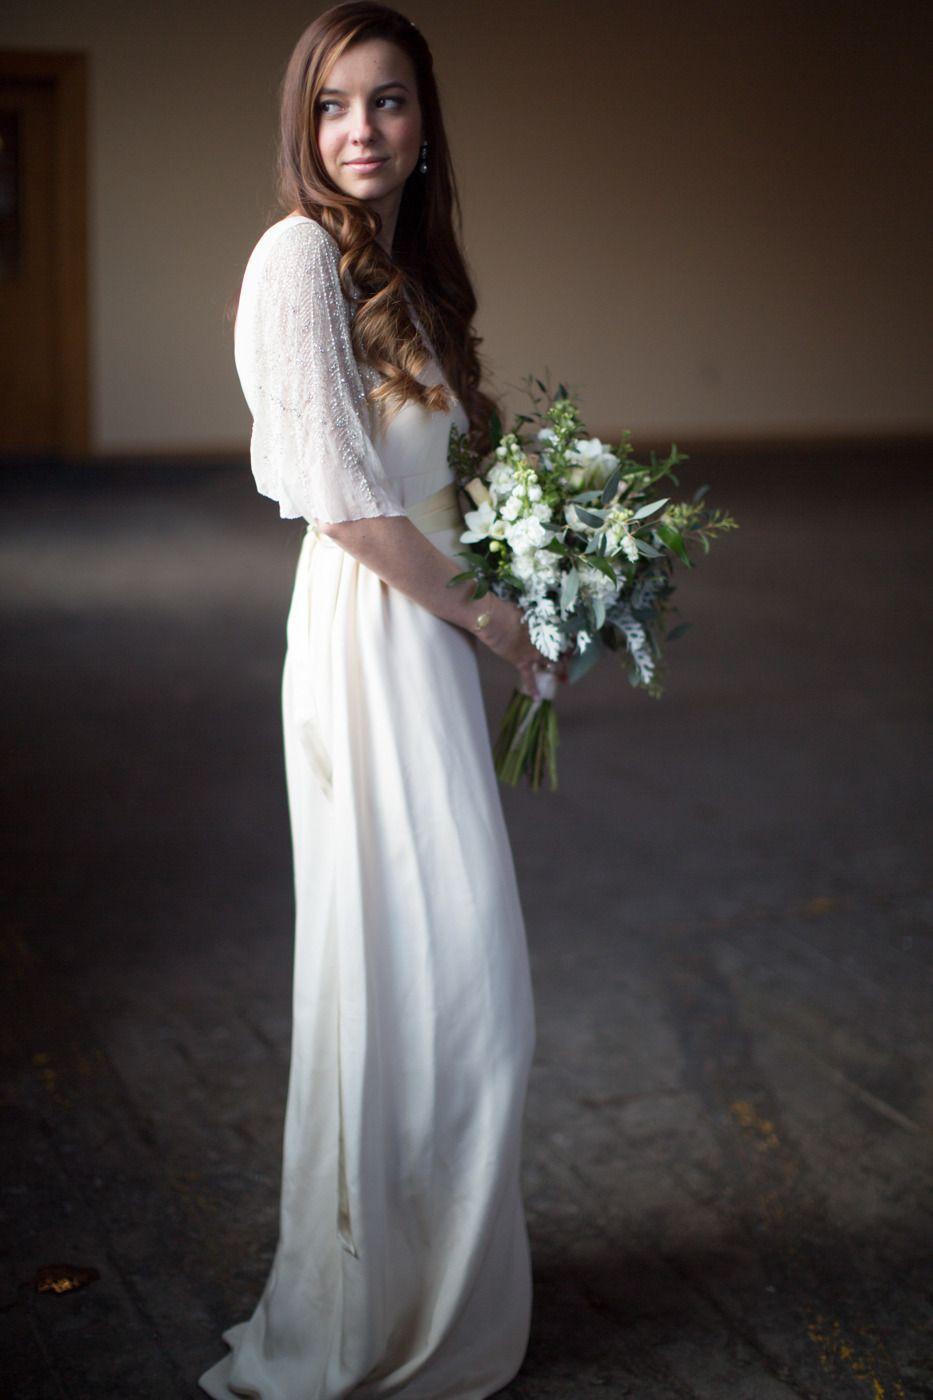 Romantic and rustic photo shoot at the baraboo arts center wedding